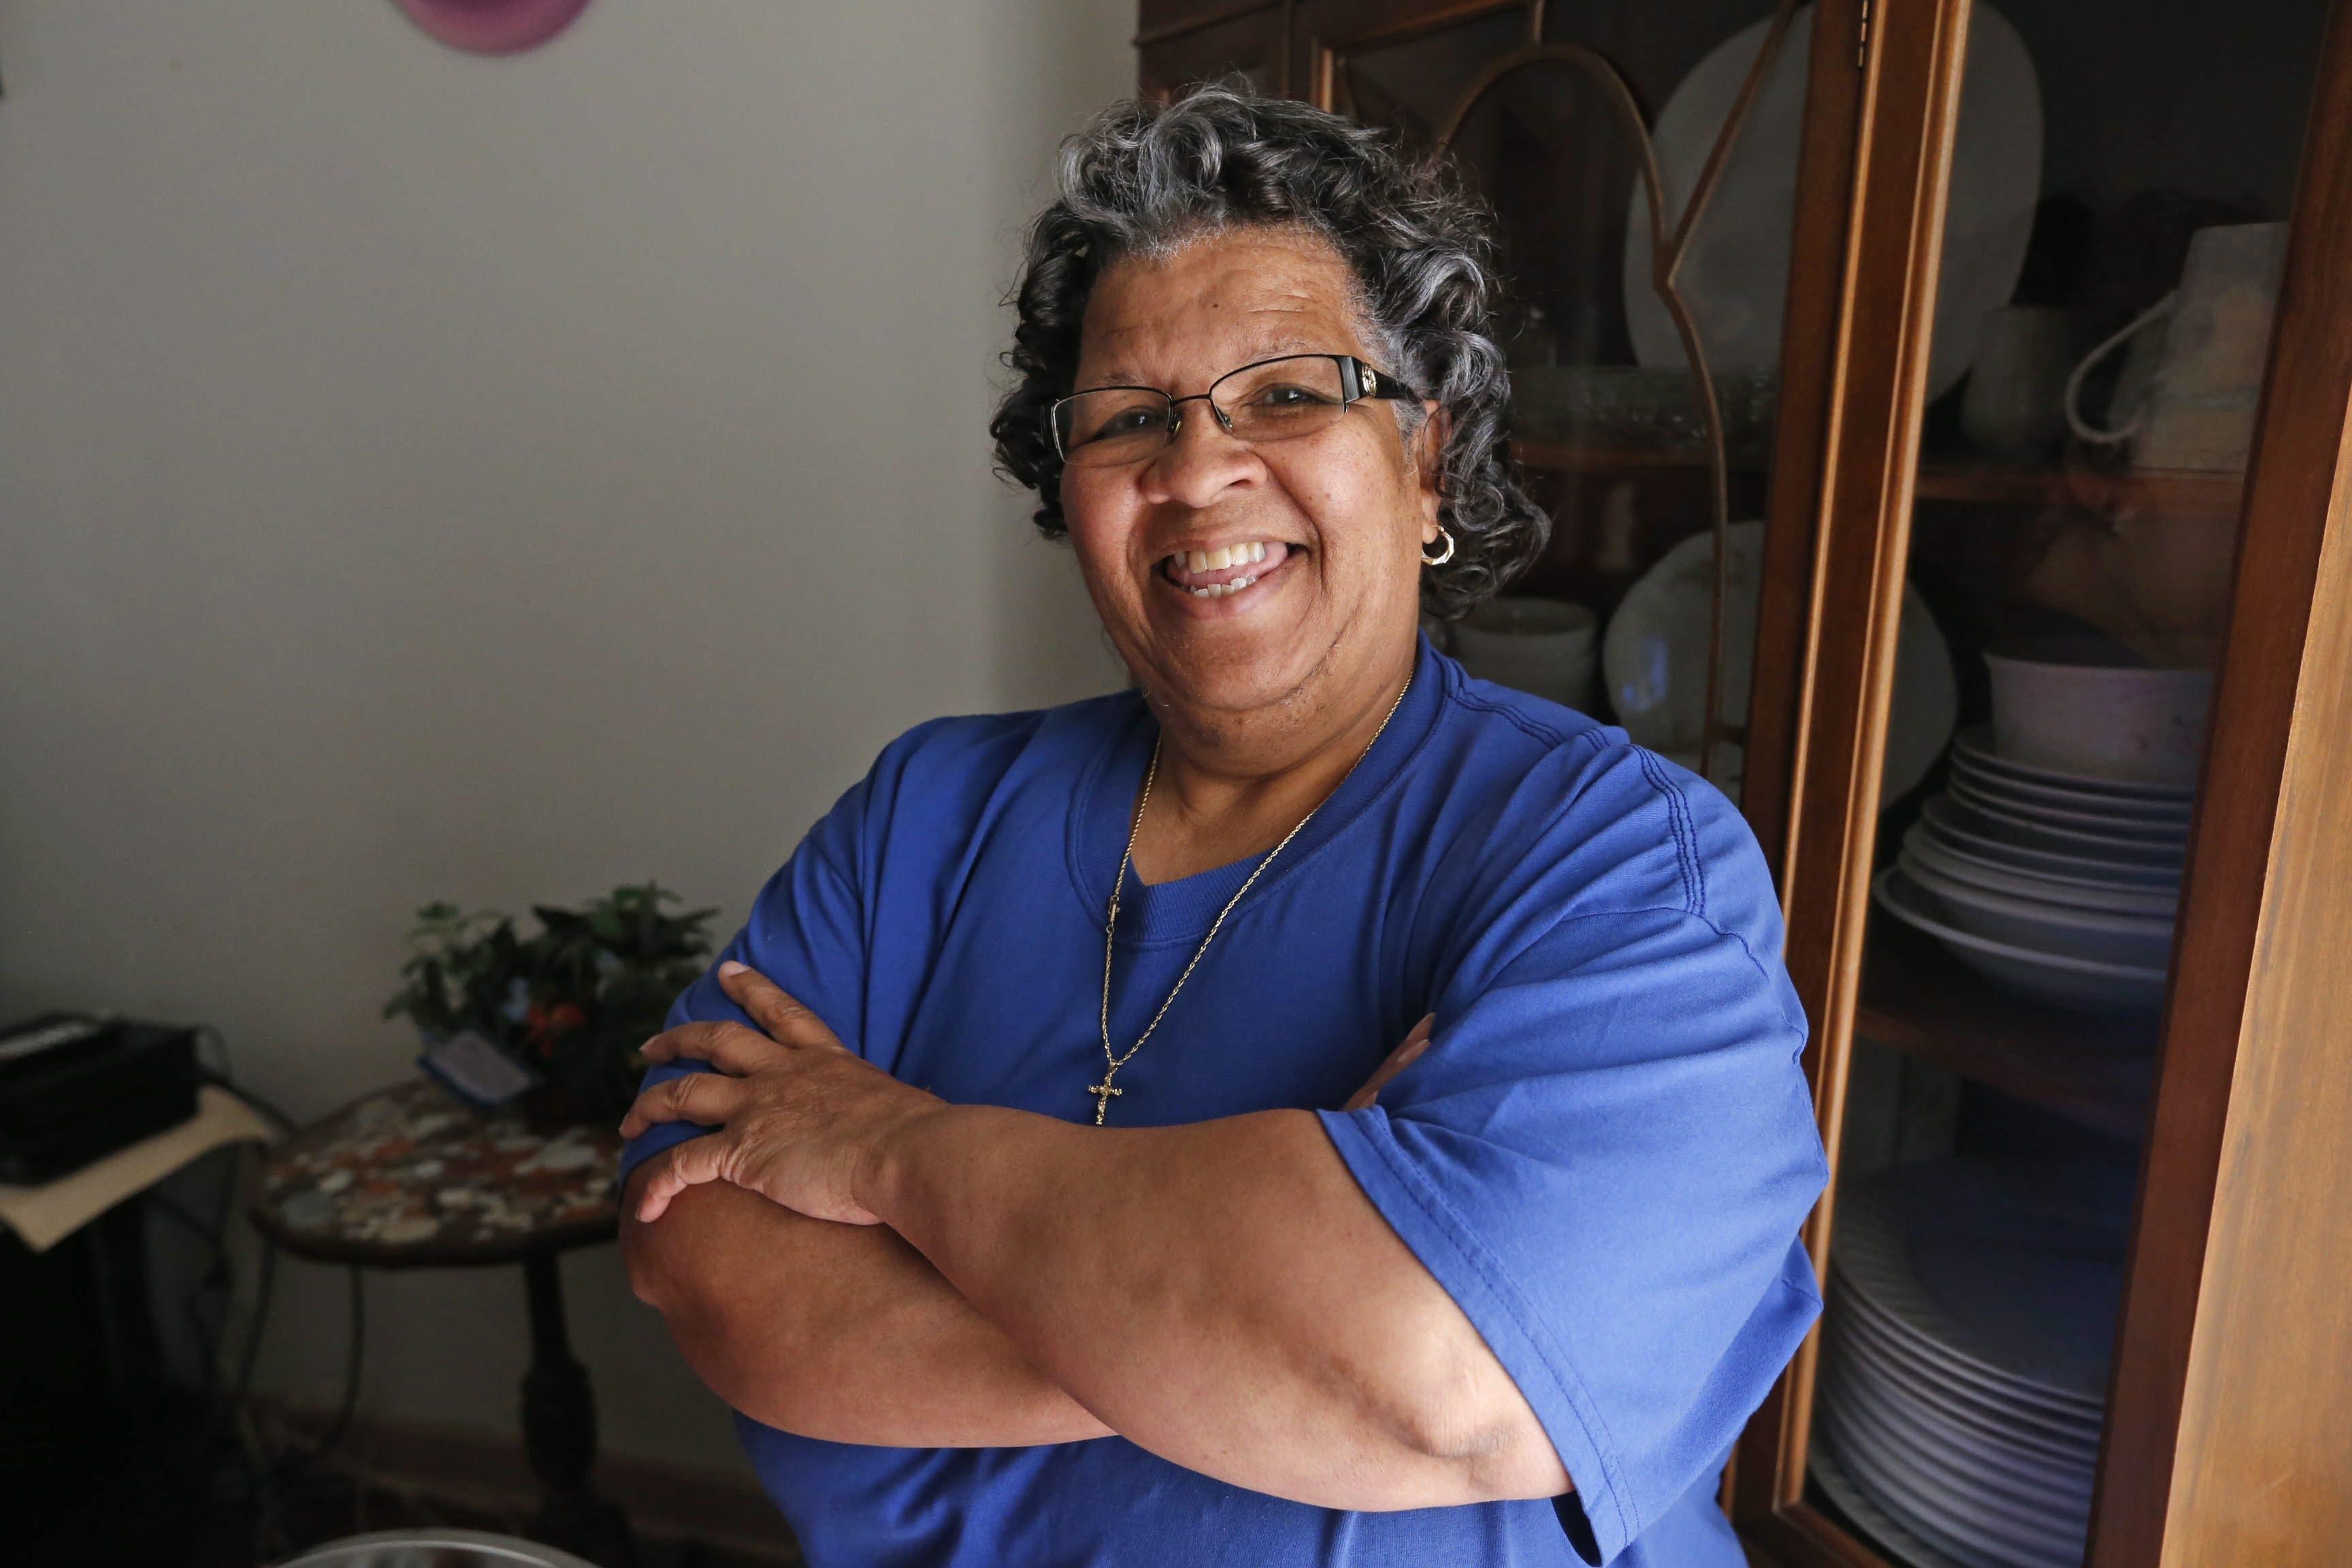 Vanessa Scott says her outreach center on Fourth Street in Niagara Falls helps women develop self-esteem.